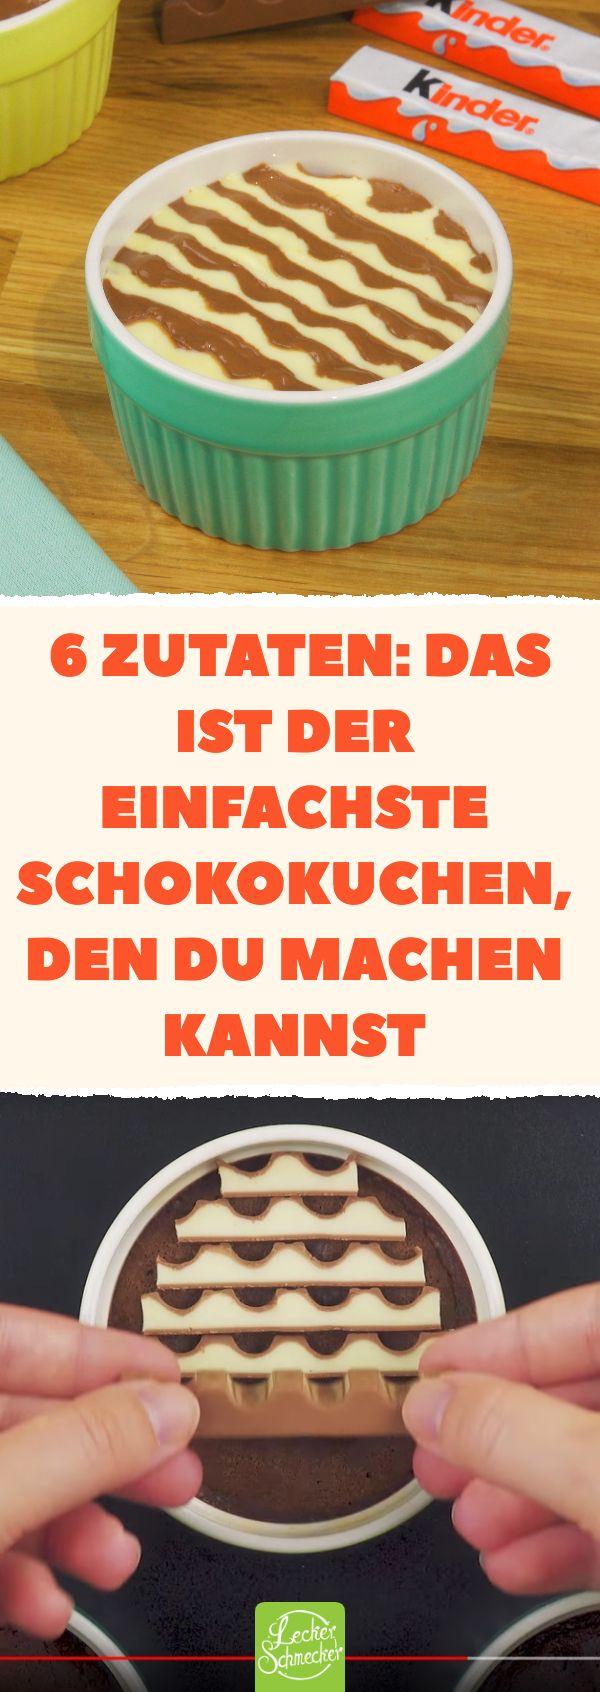 Superschneller, einfacher #Kinderschokolade #Tassenkuchen. #schokolade #rezept #…